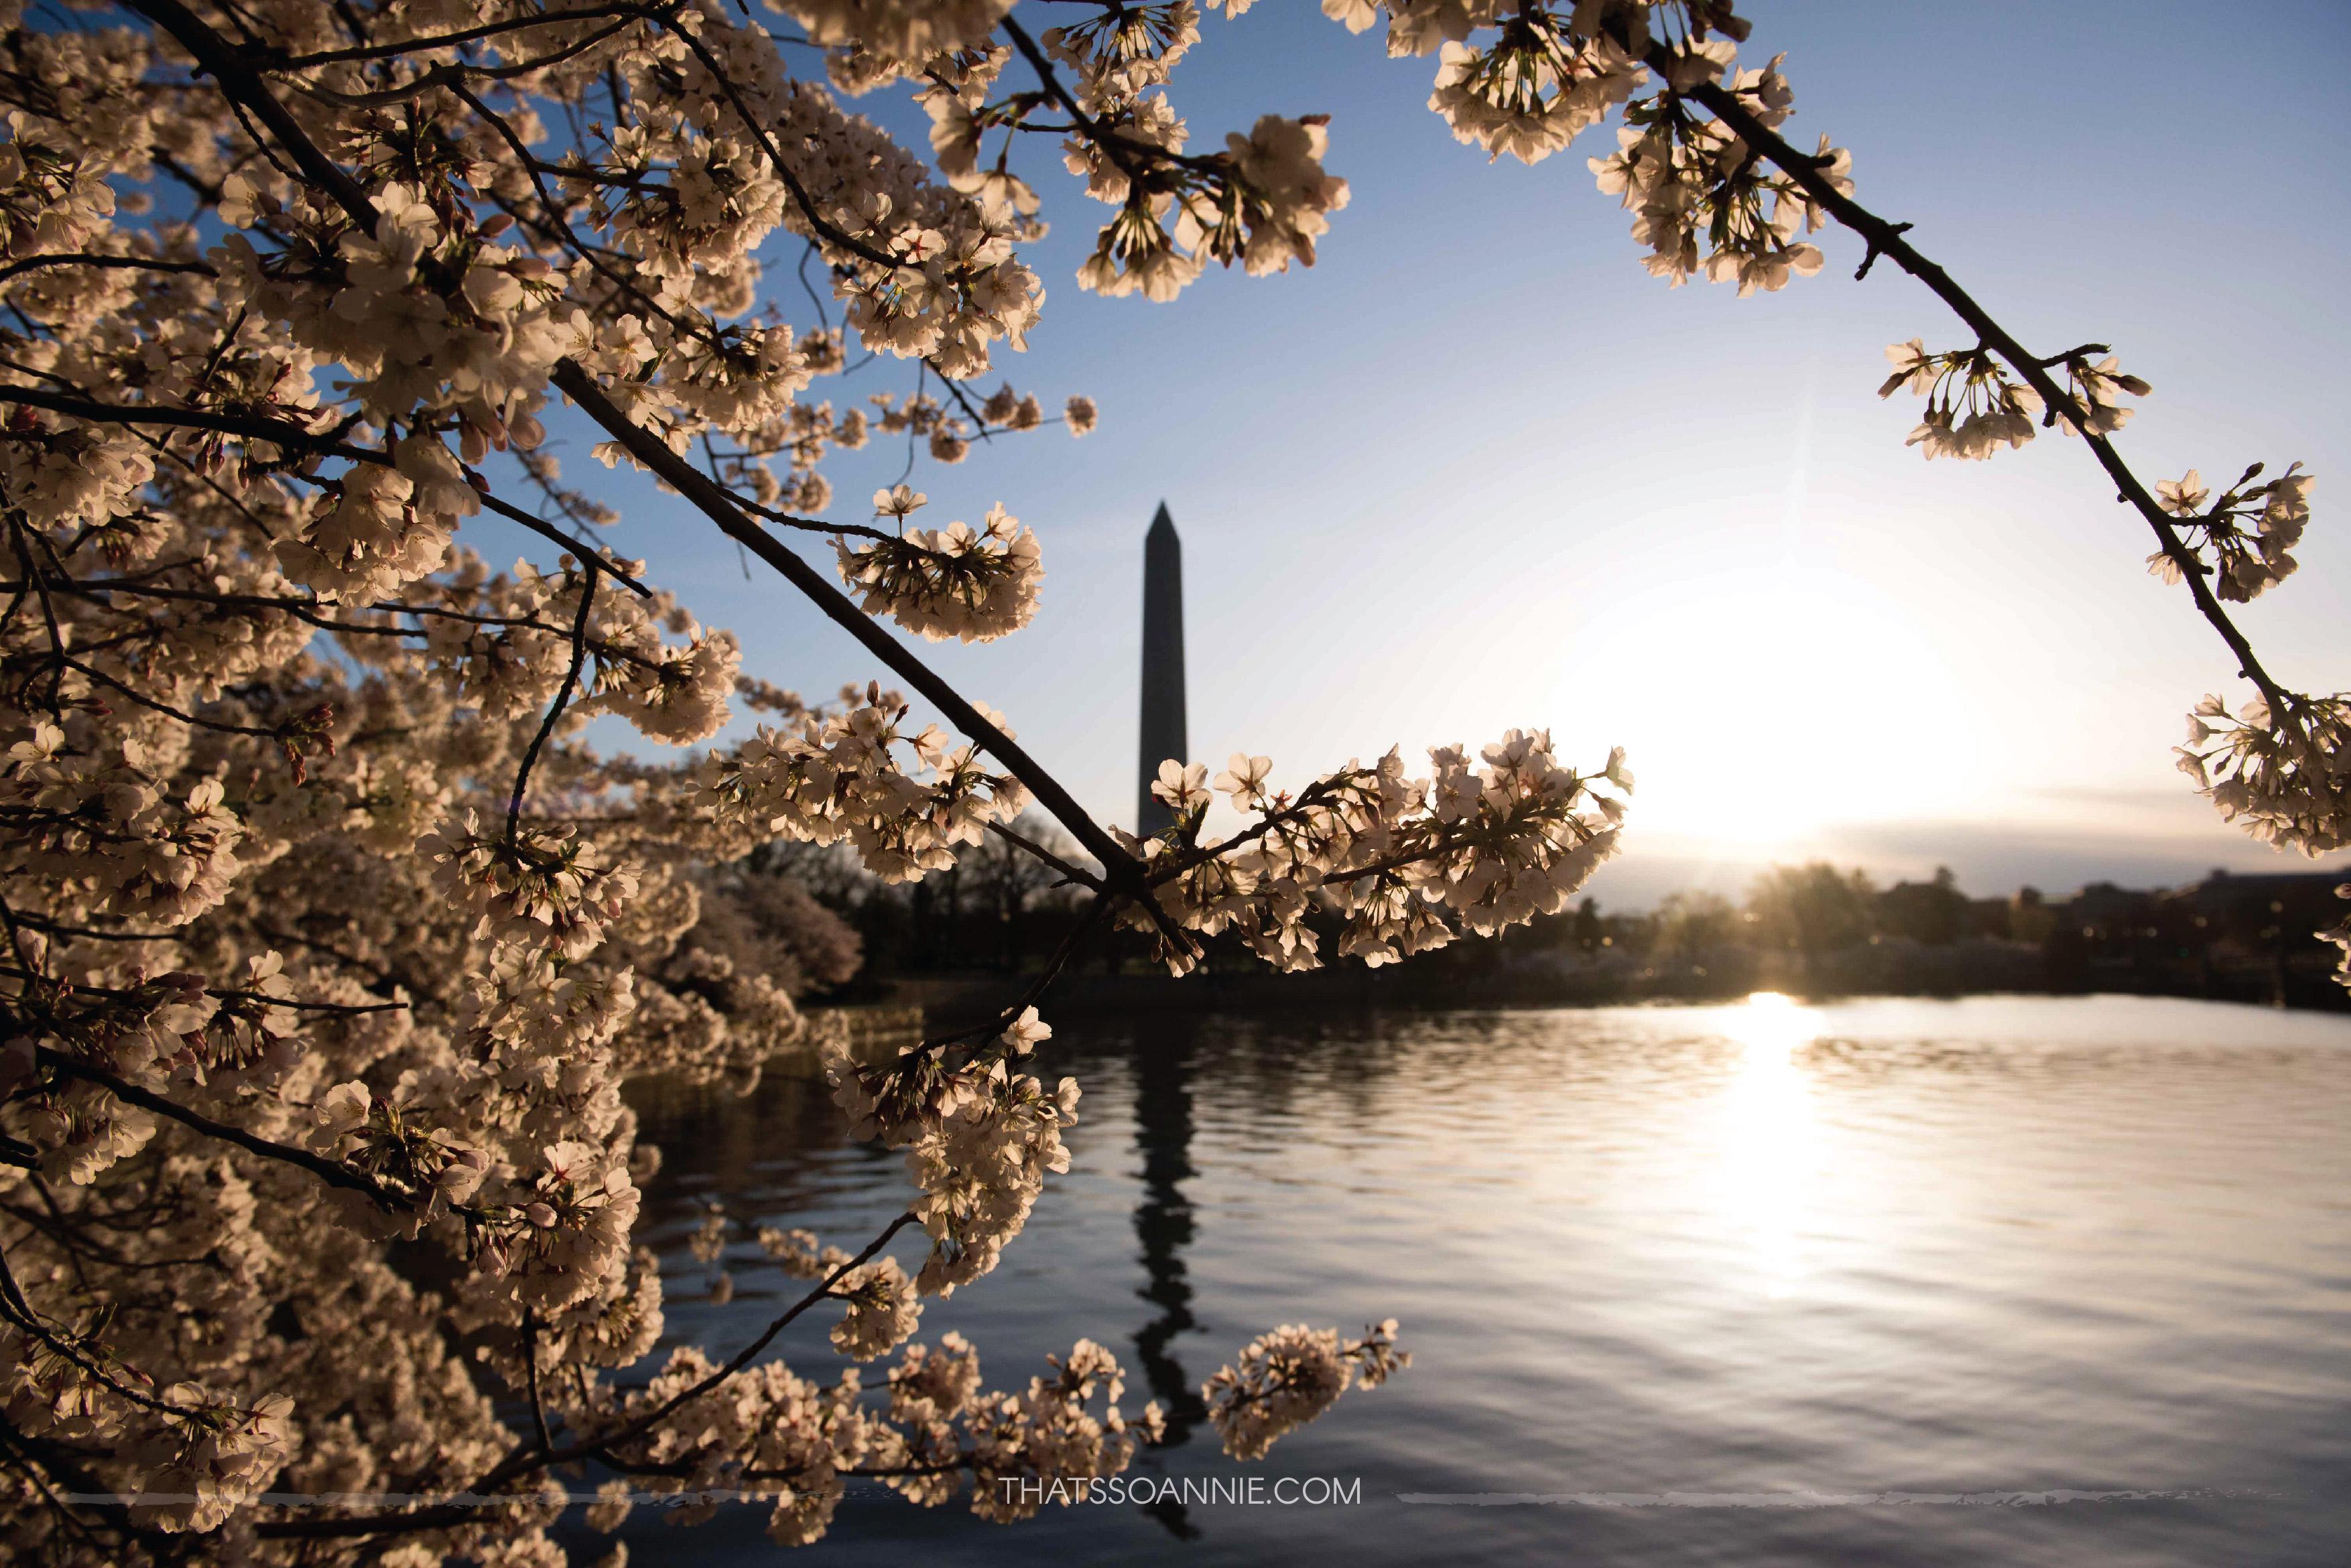 Washington Monument, as seen at dawn from Tidal Basin